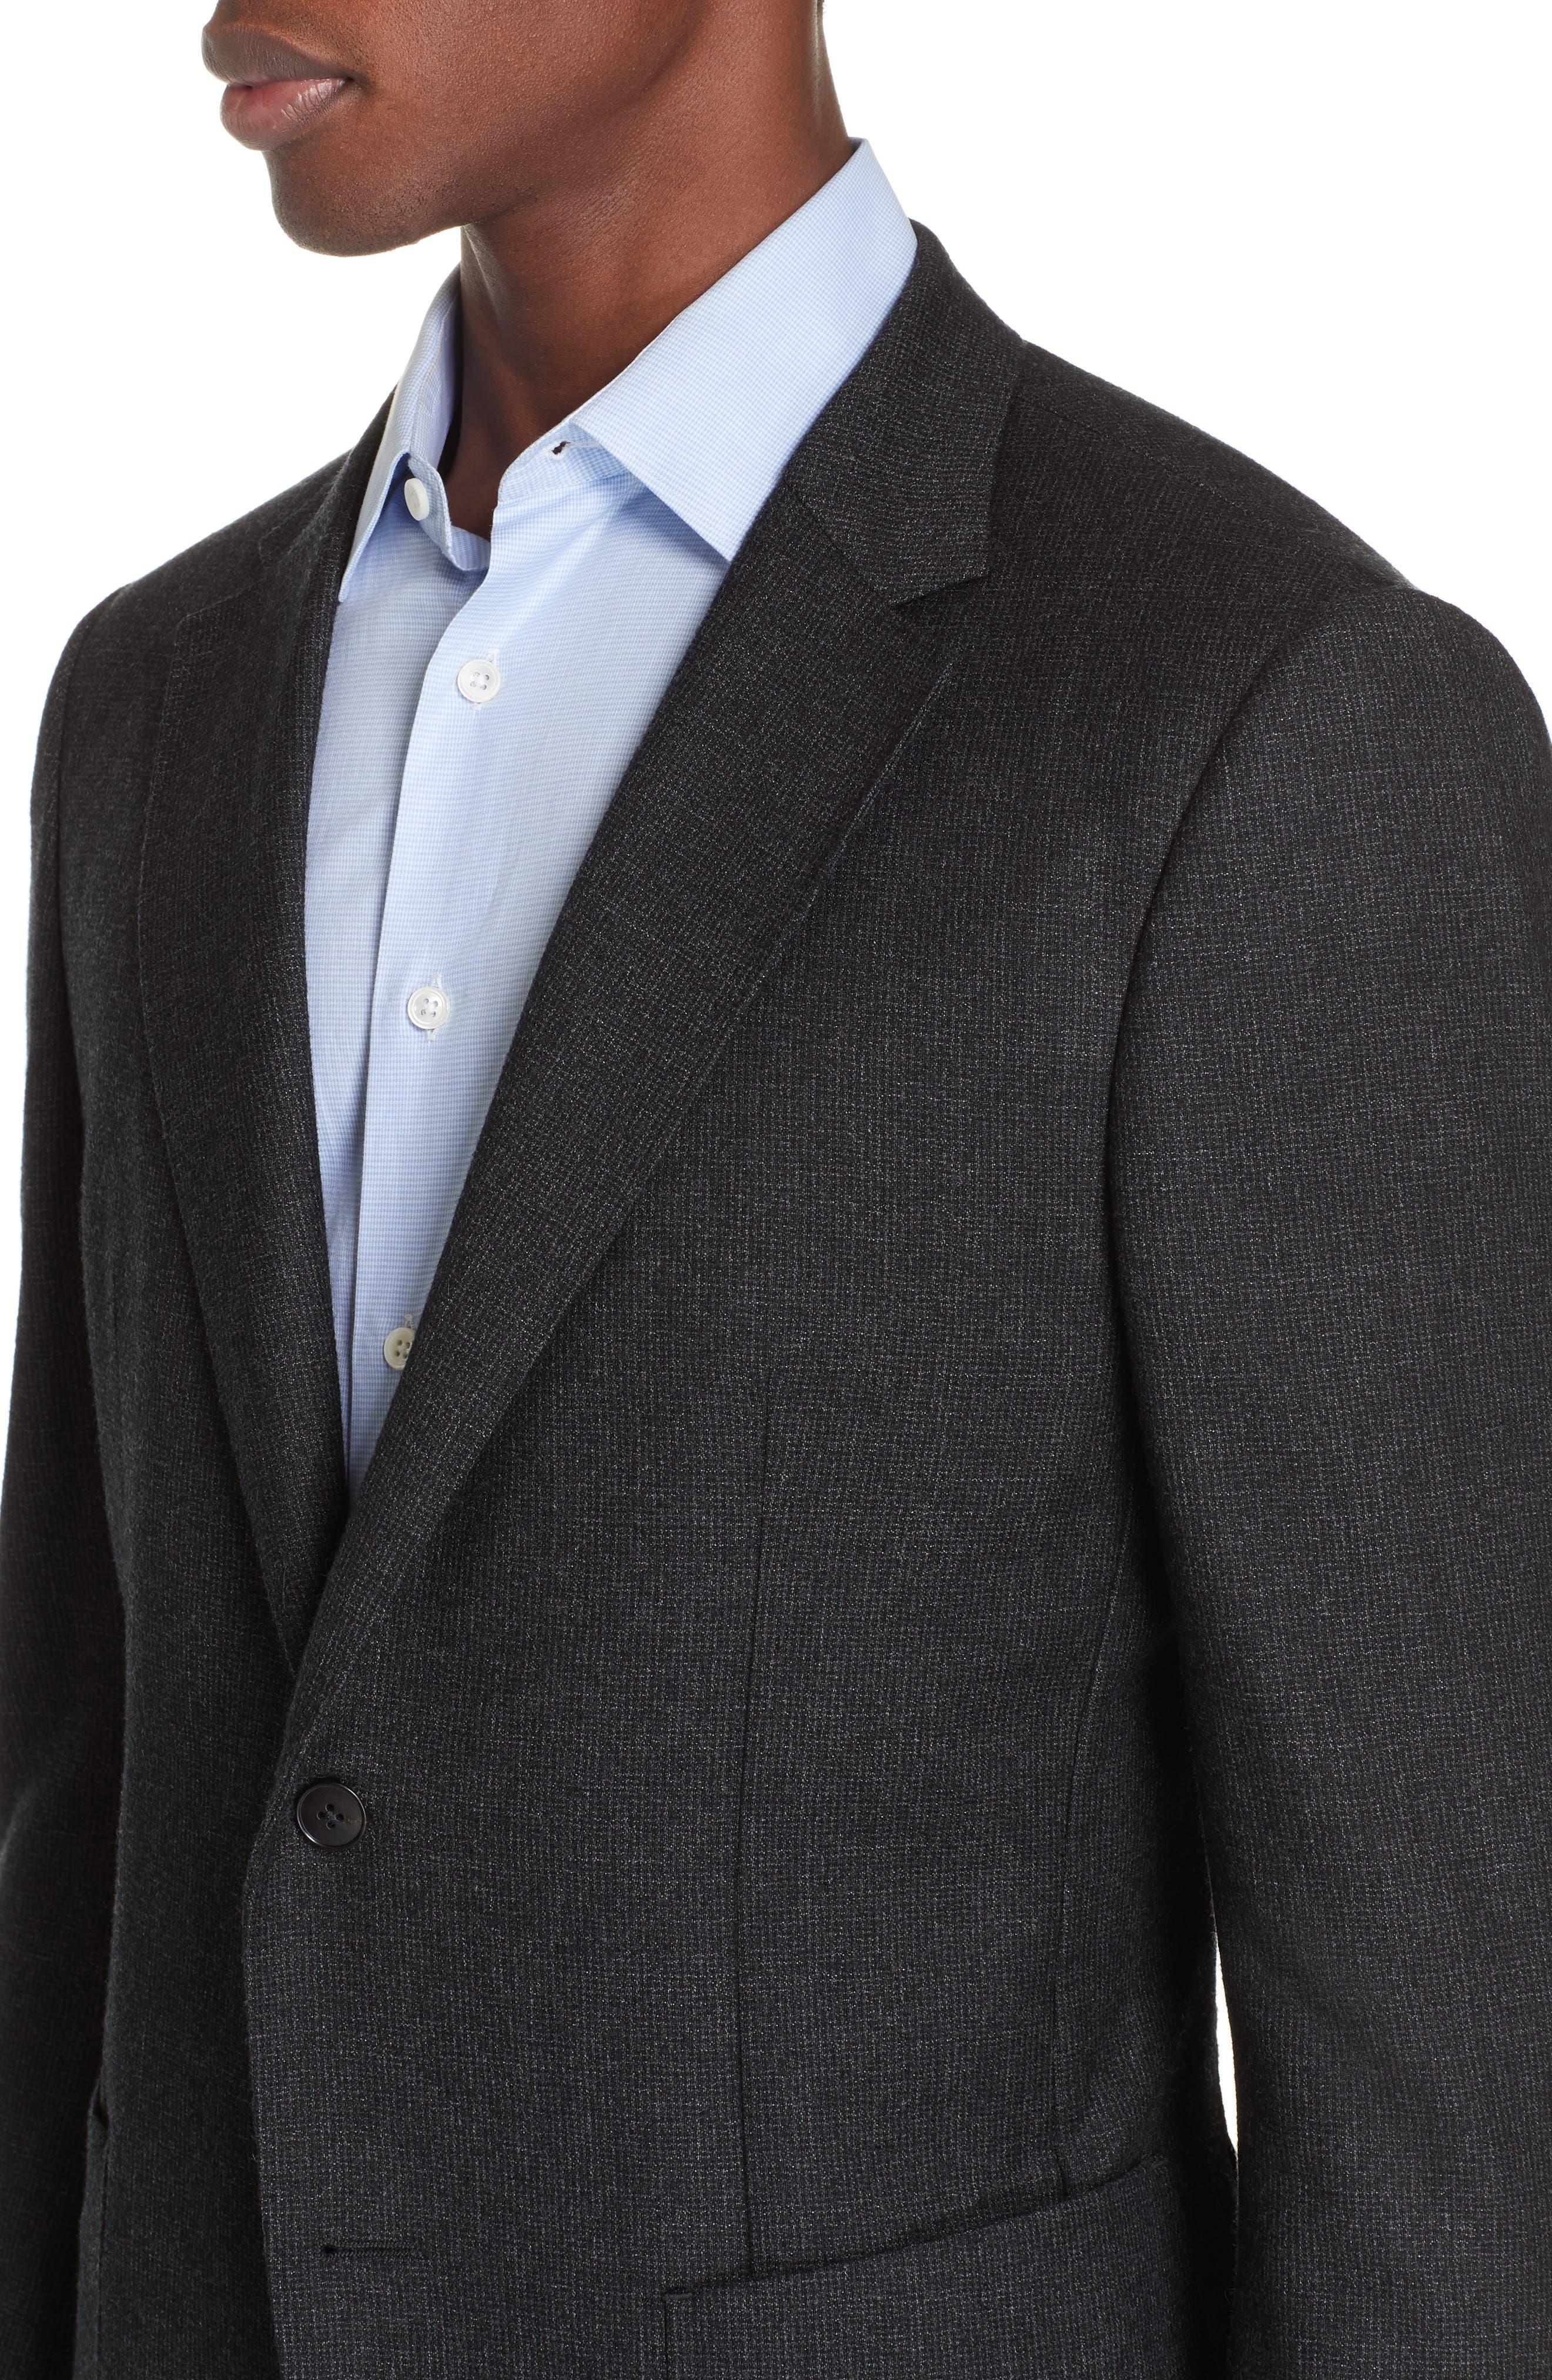 Trim Fit Wash & Go Solid Wool Suit,                             Alternate thumbnail 4, color,                             GREY